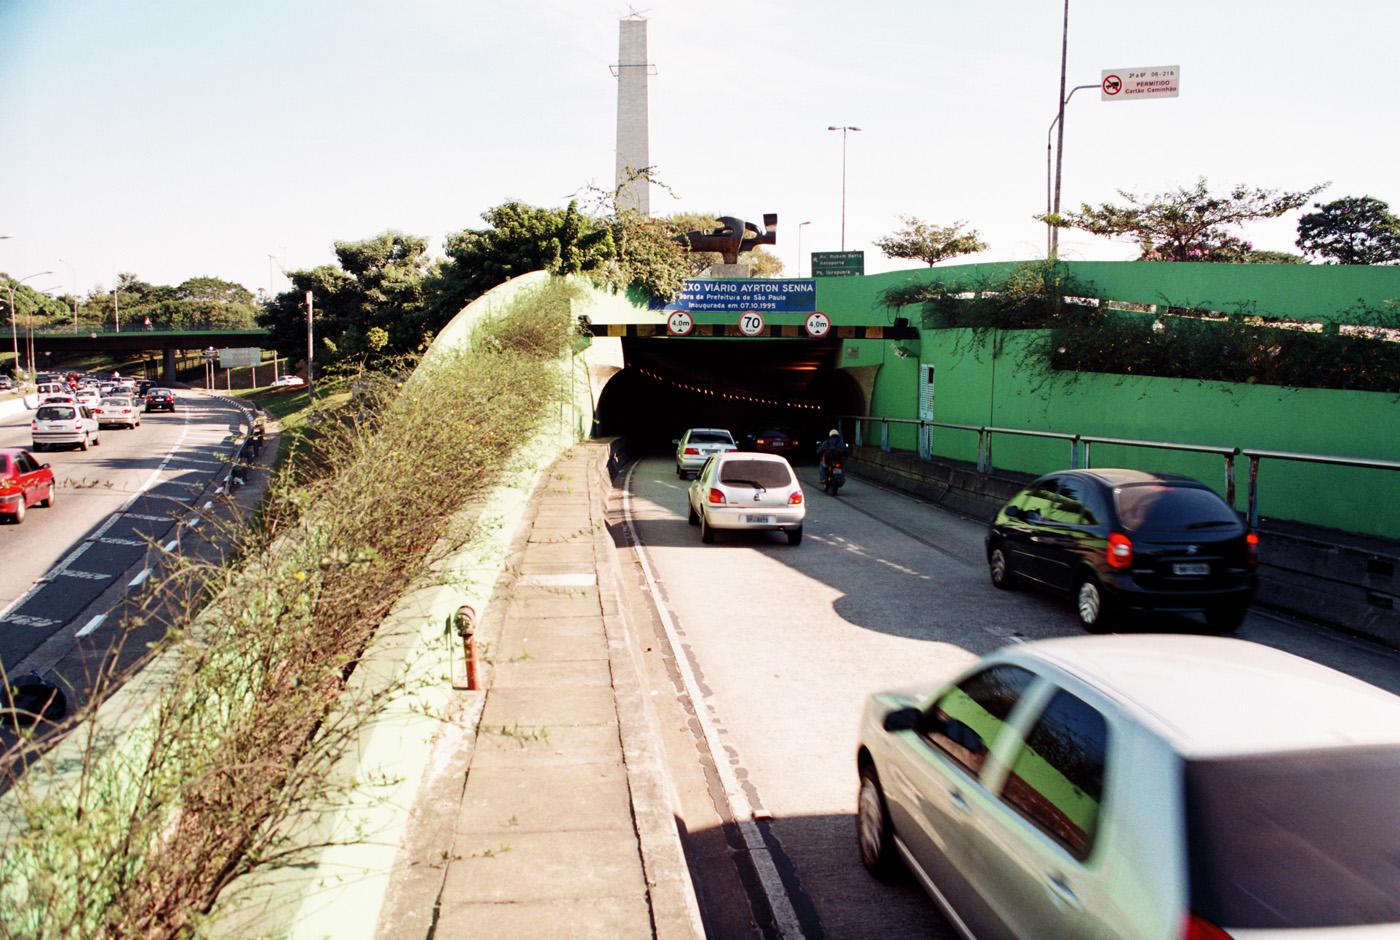 42_20130626014911_tunel-ayrton-senna-2-